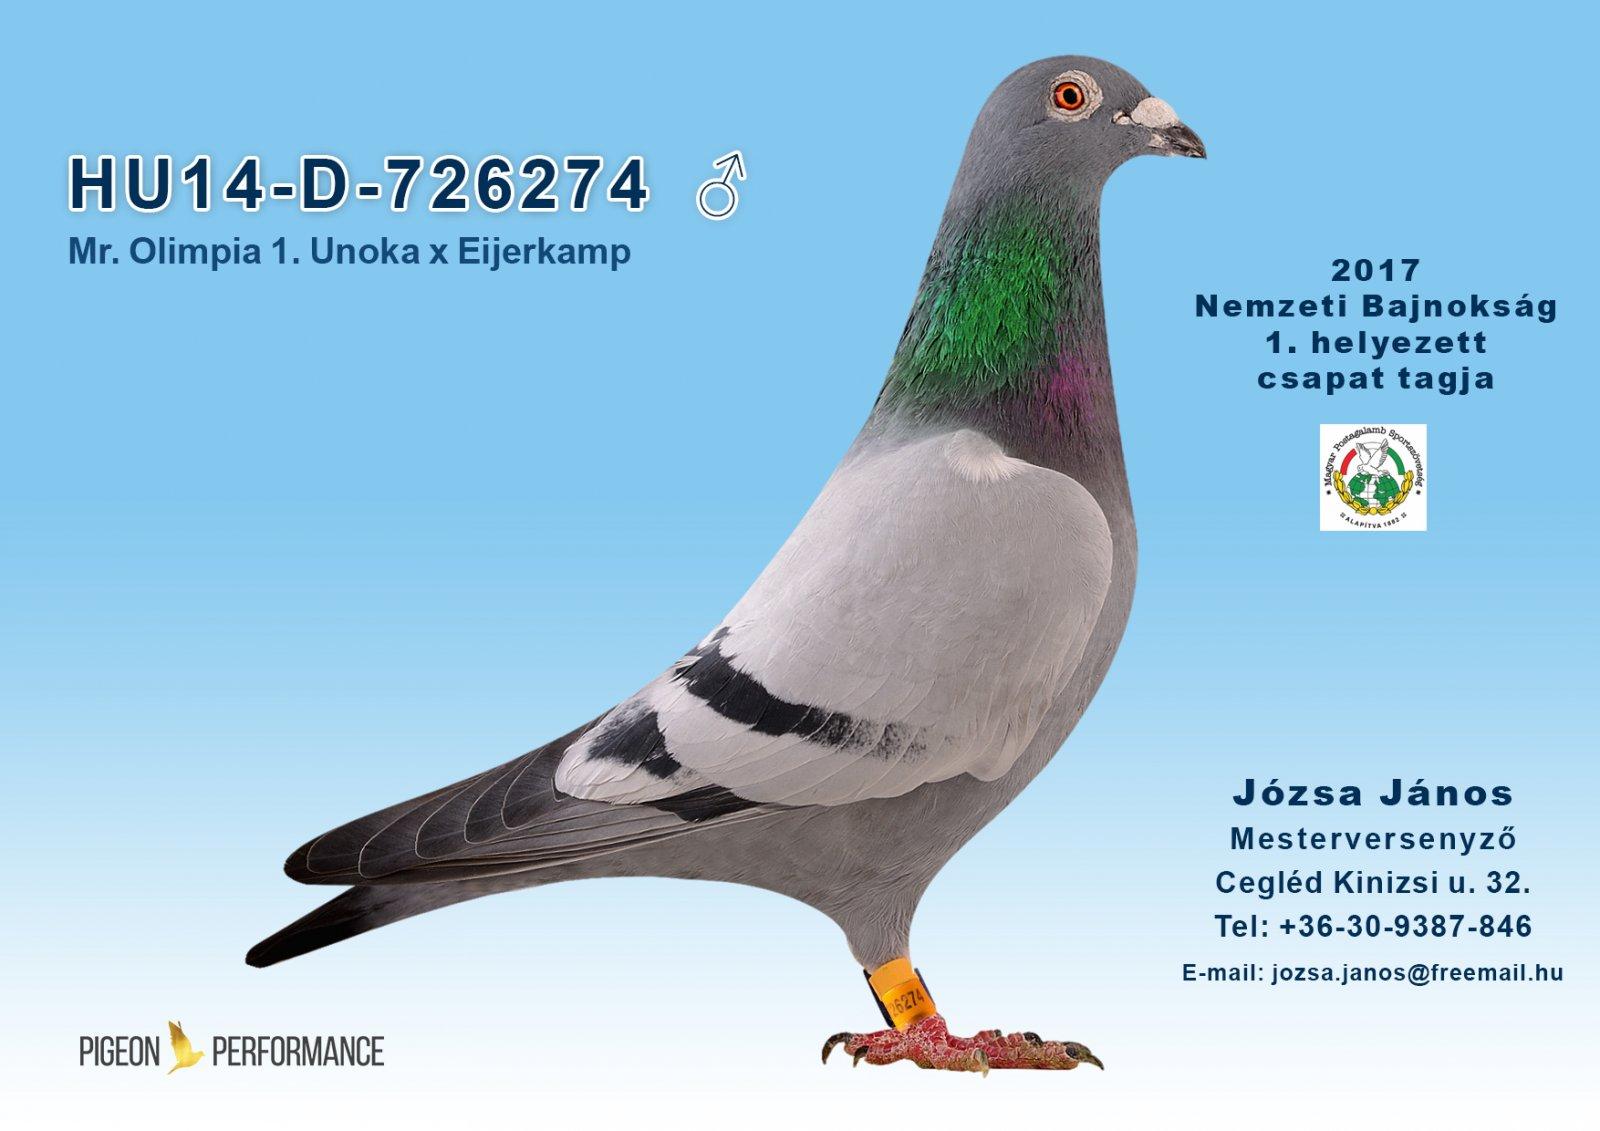 HU-2014-D-726274